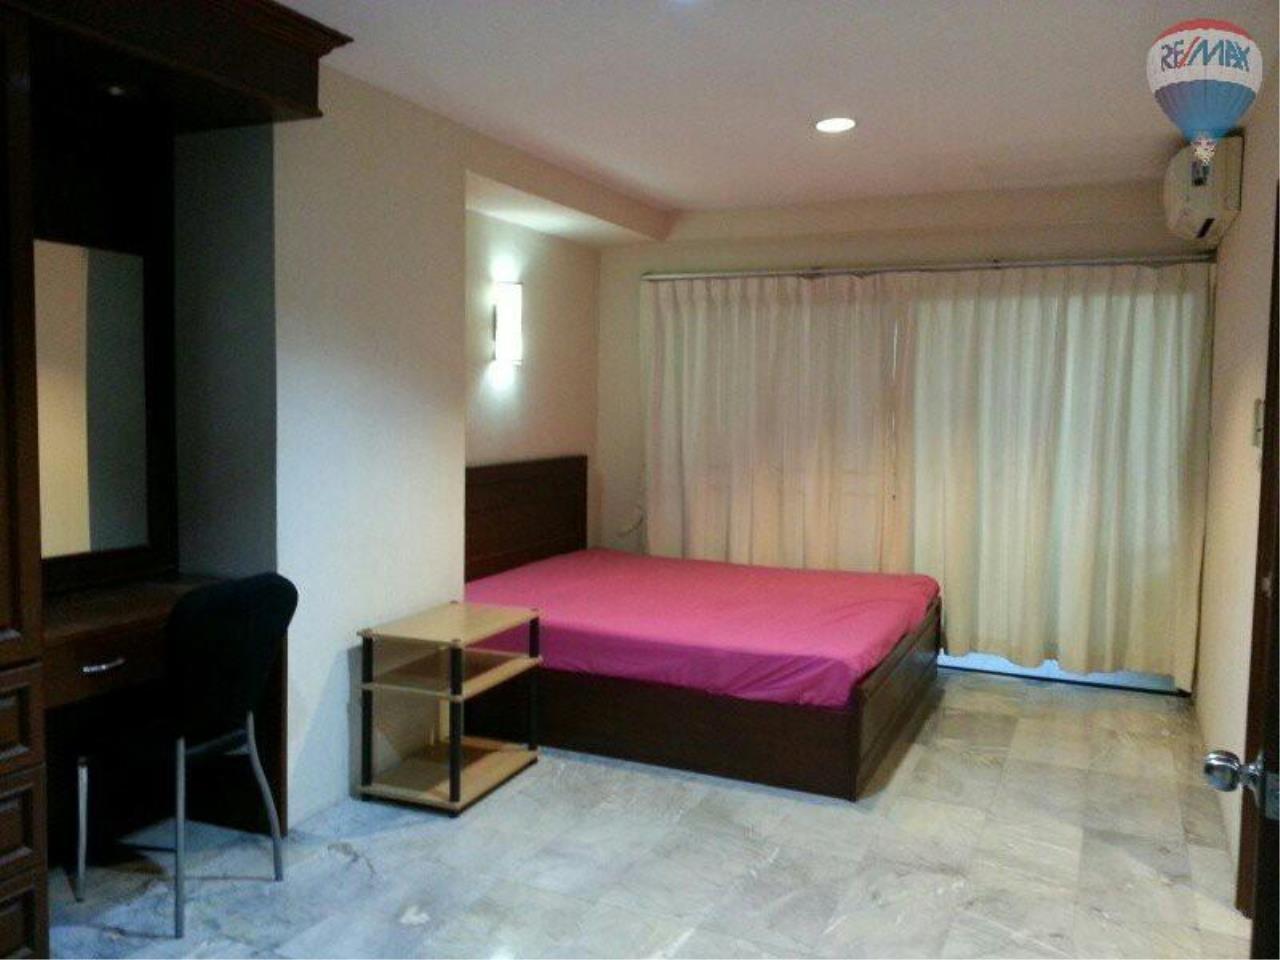 RE/MAX Properties Agency's 1 Bedroom 56 Sq.m for SALE at Saranjai Mansion,Sukhumvit Soi 4 (Nana) 3